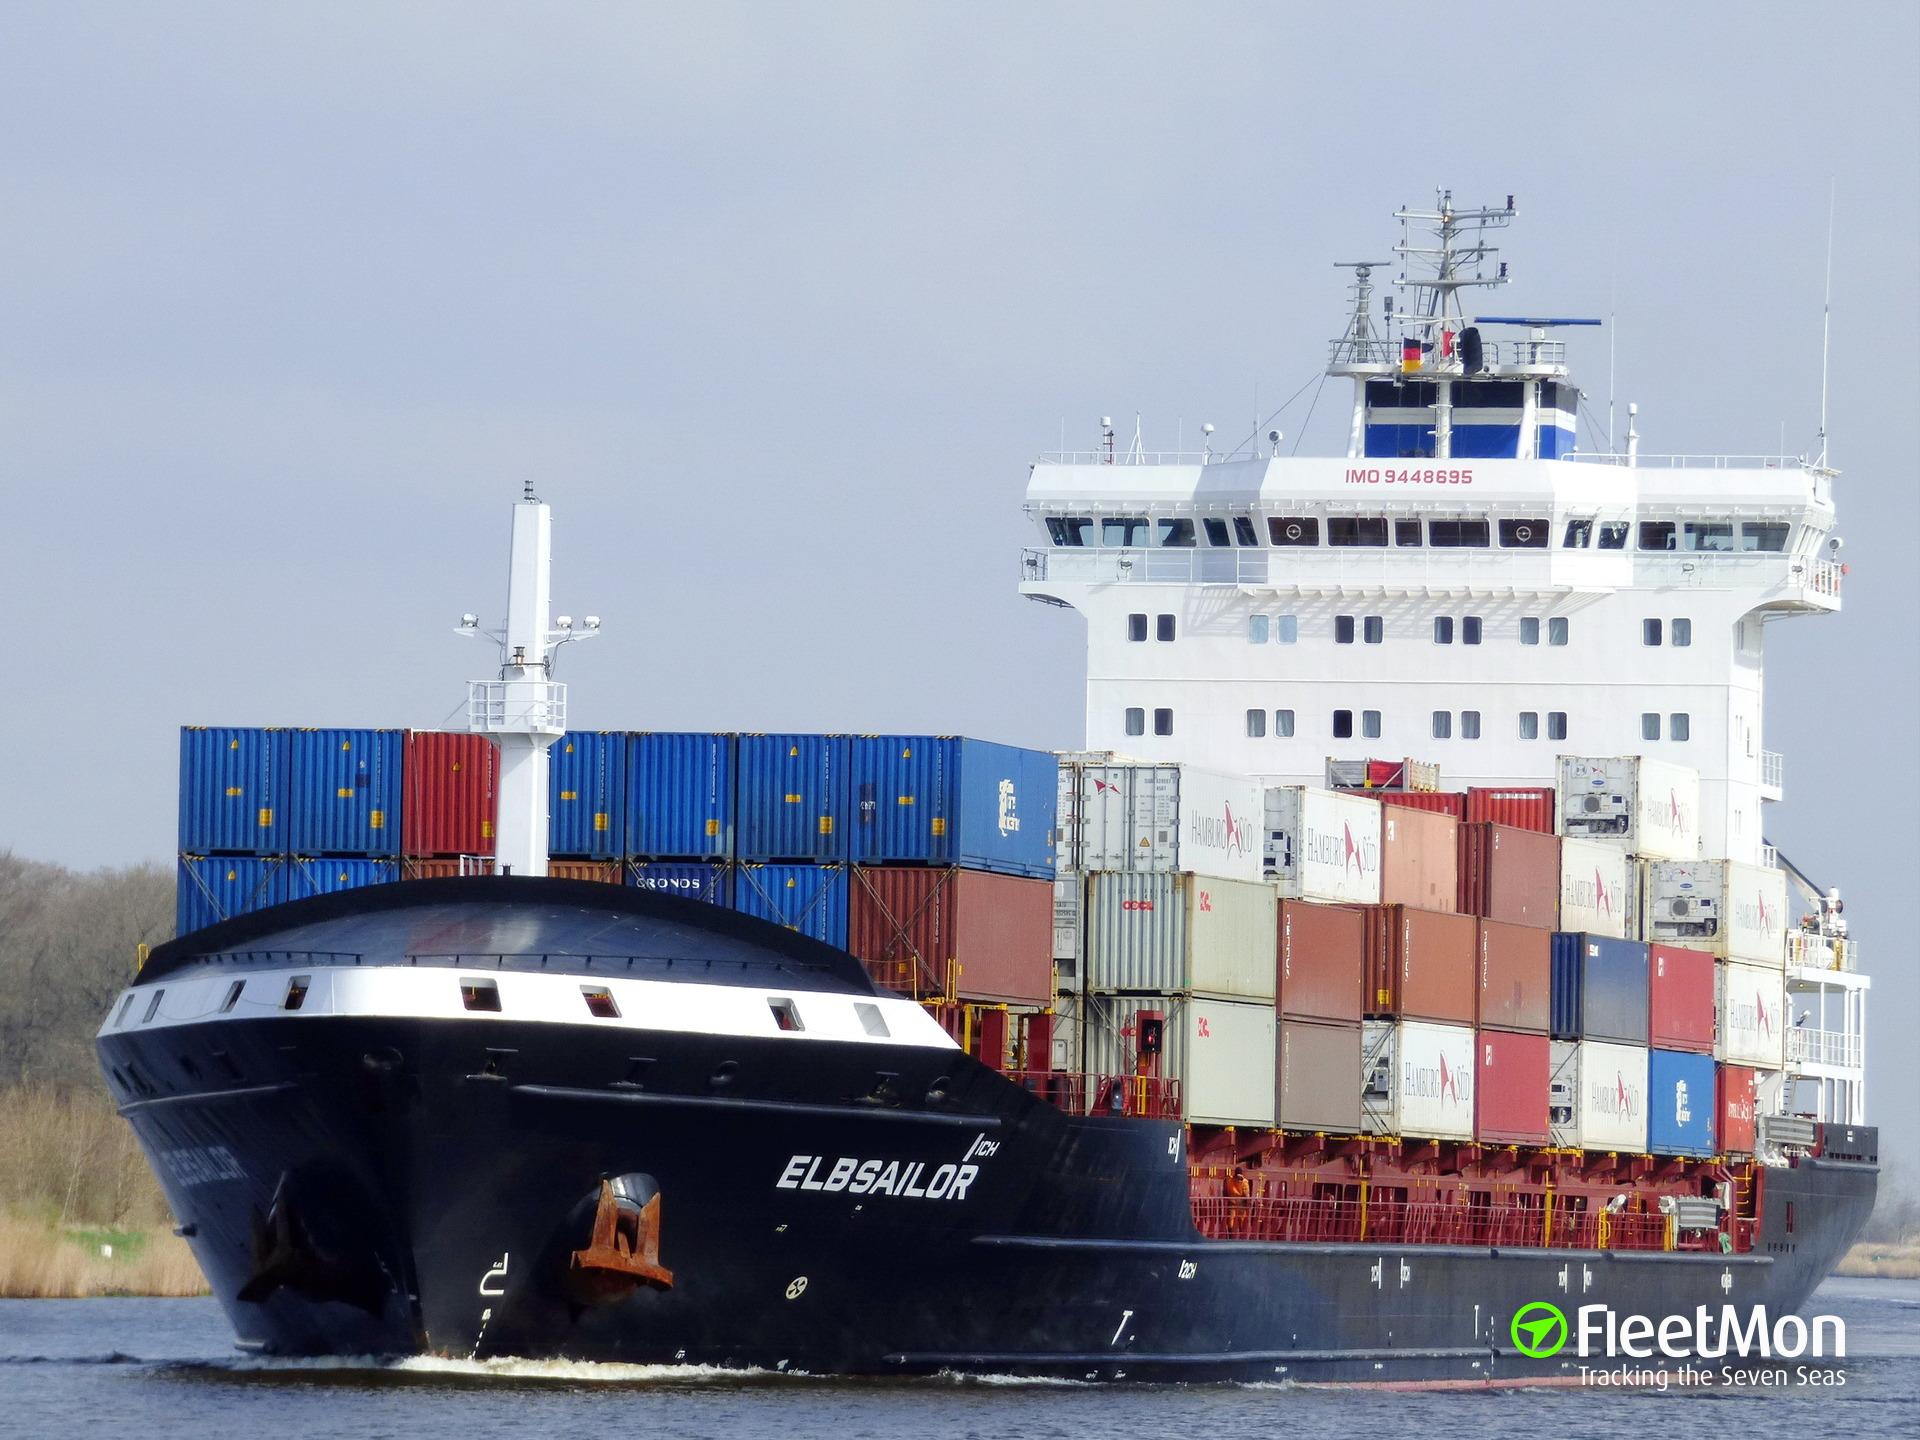 E. R. VISBY grounding blocked Kiel Canal